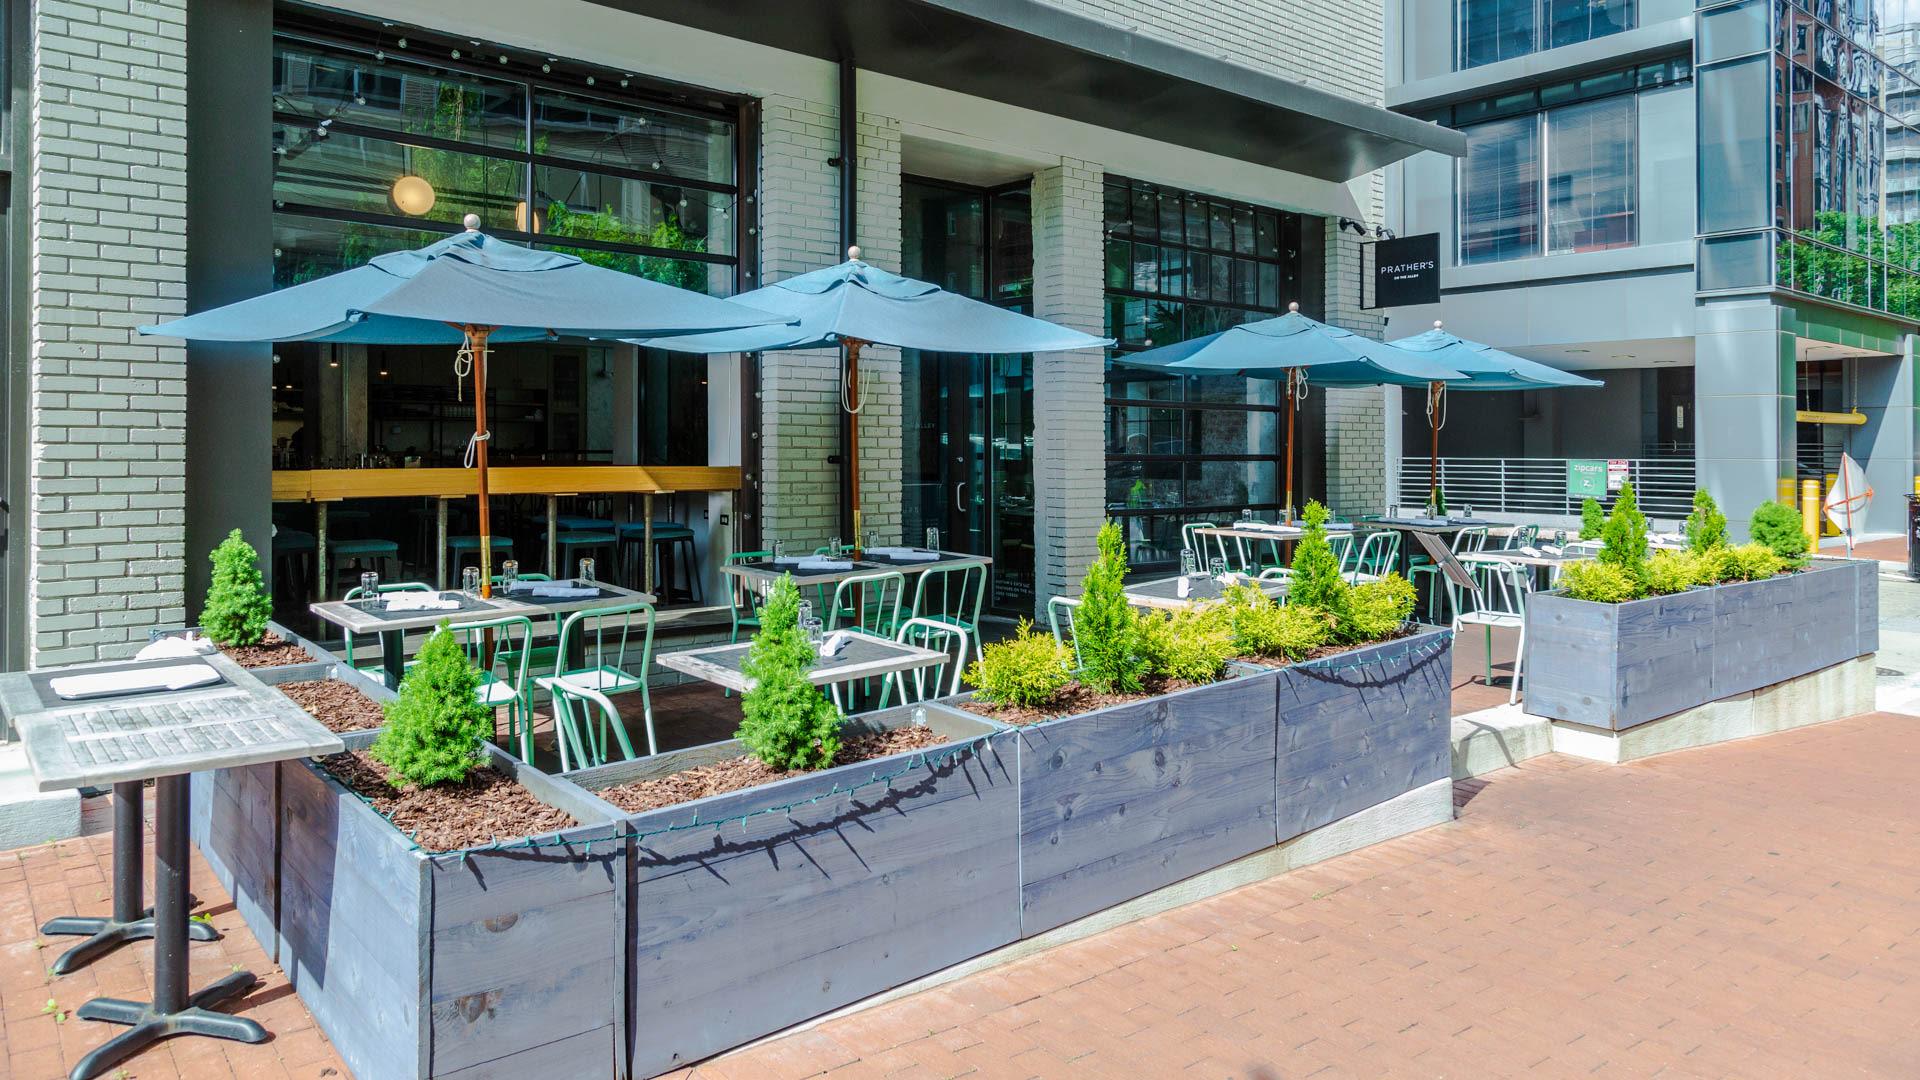 455 Eye Street Apartments - In-building Retail